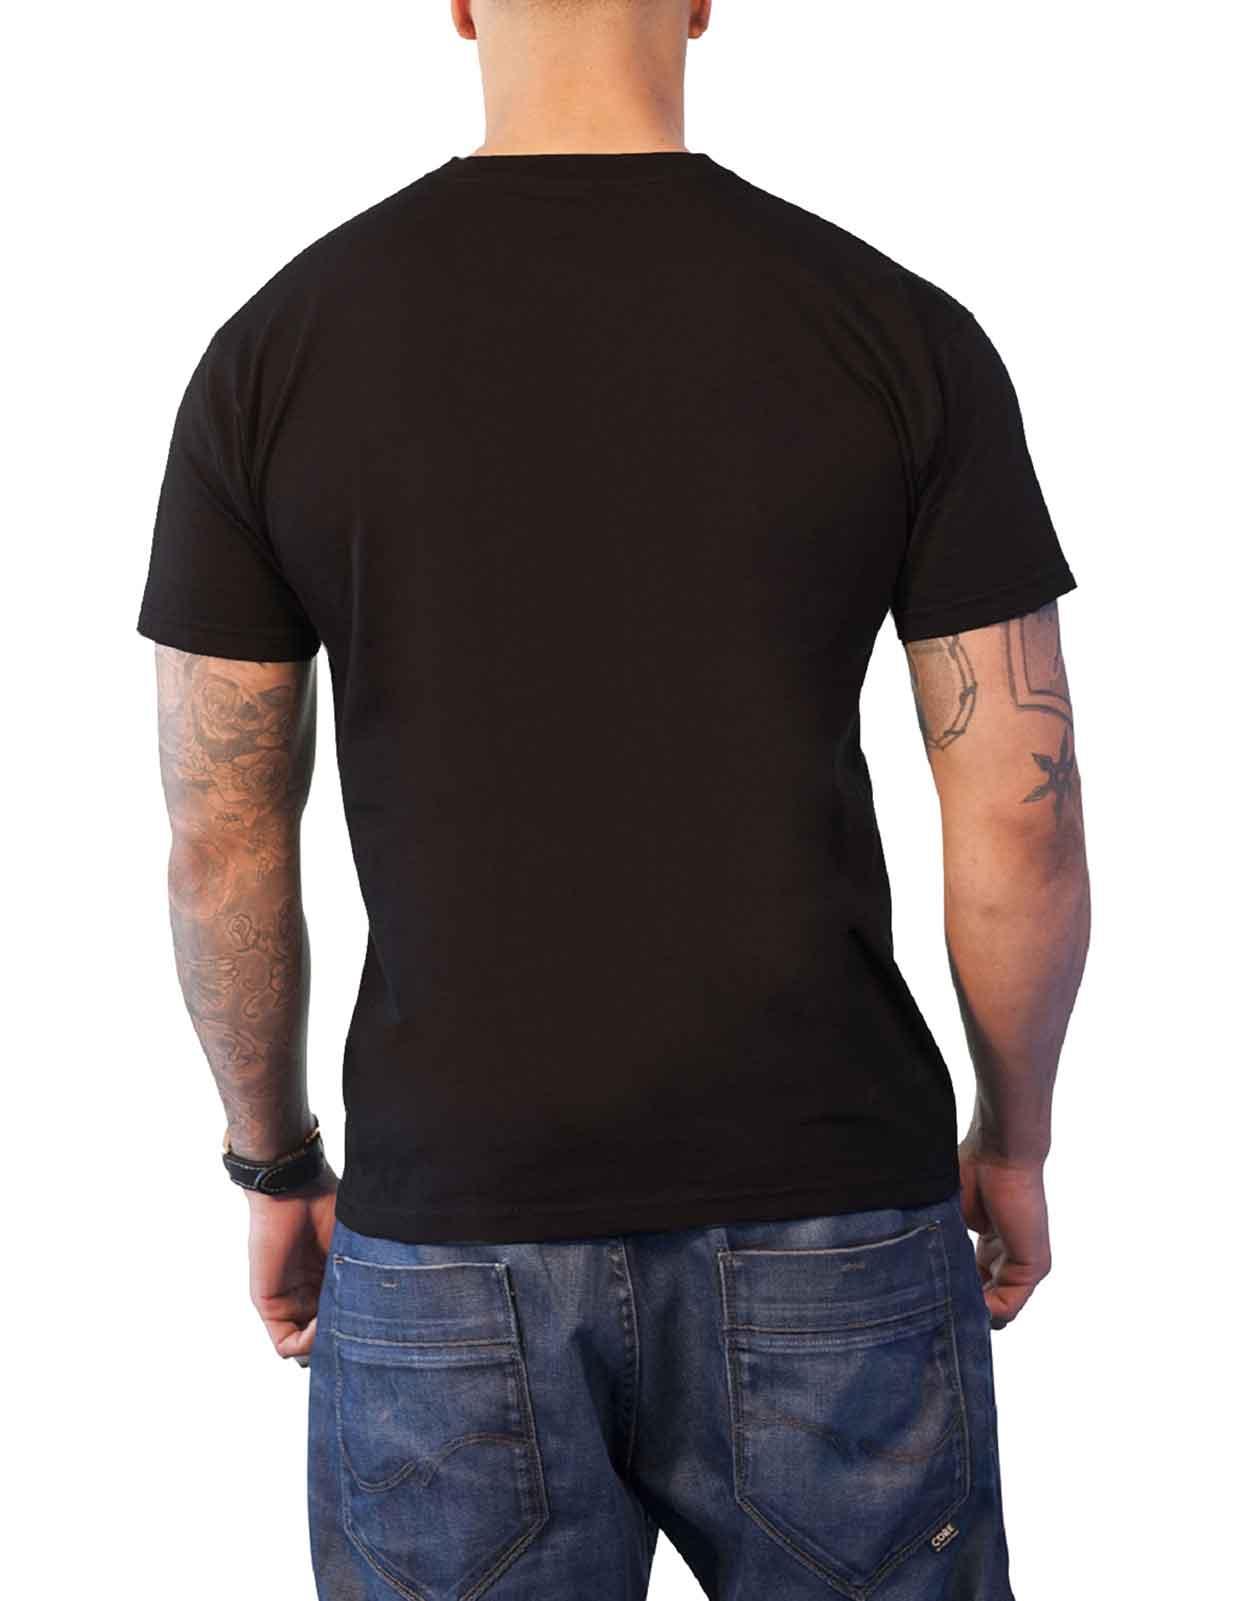 Iron-Maiden-T-Shirt-Book-Of-Souls-Tour-Telecharger-Nordic-2016-Legacy-officiel-Homme miniature 7